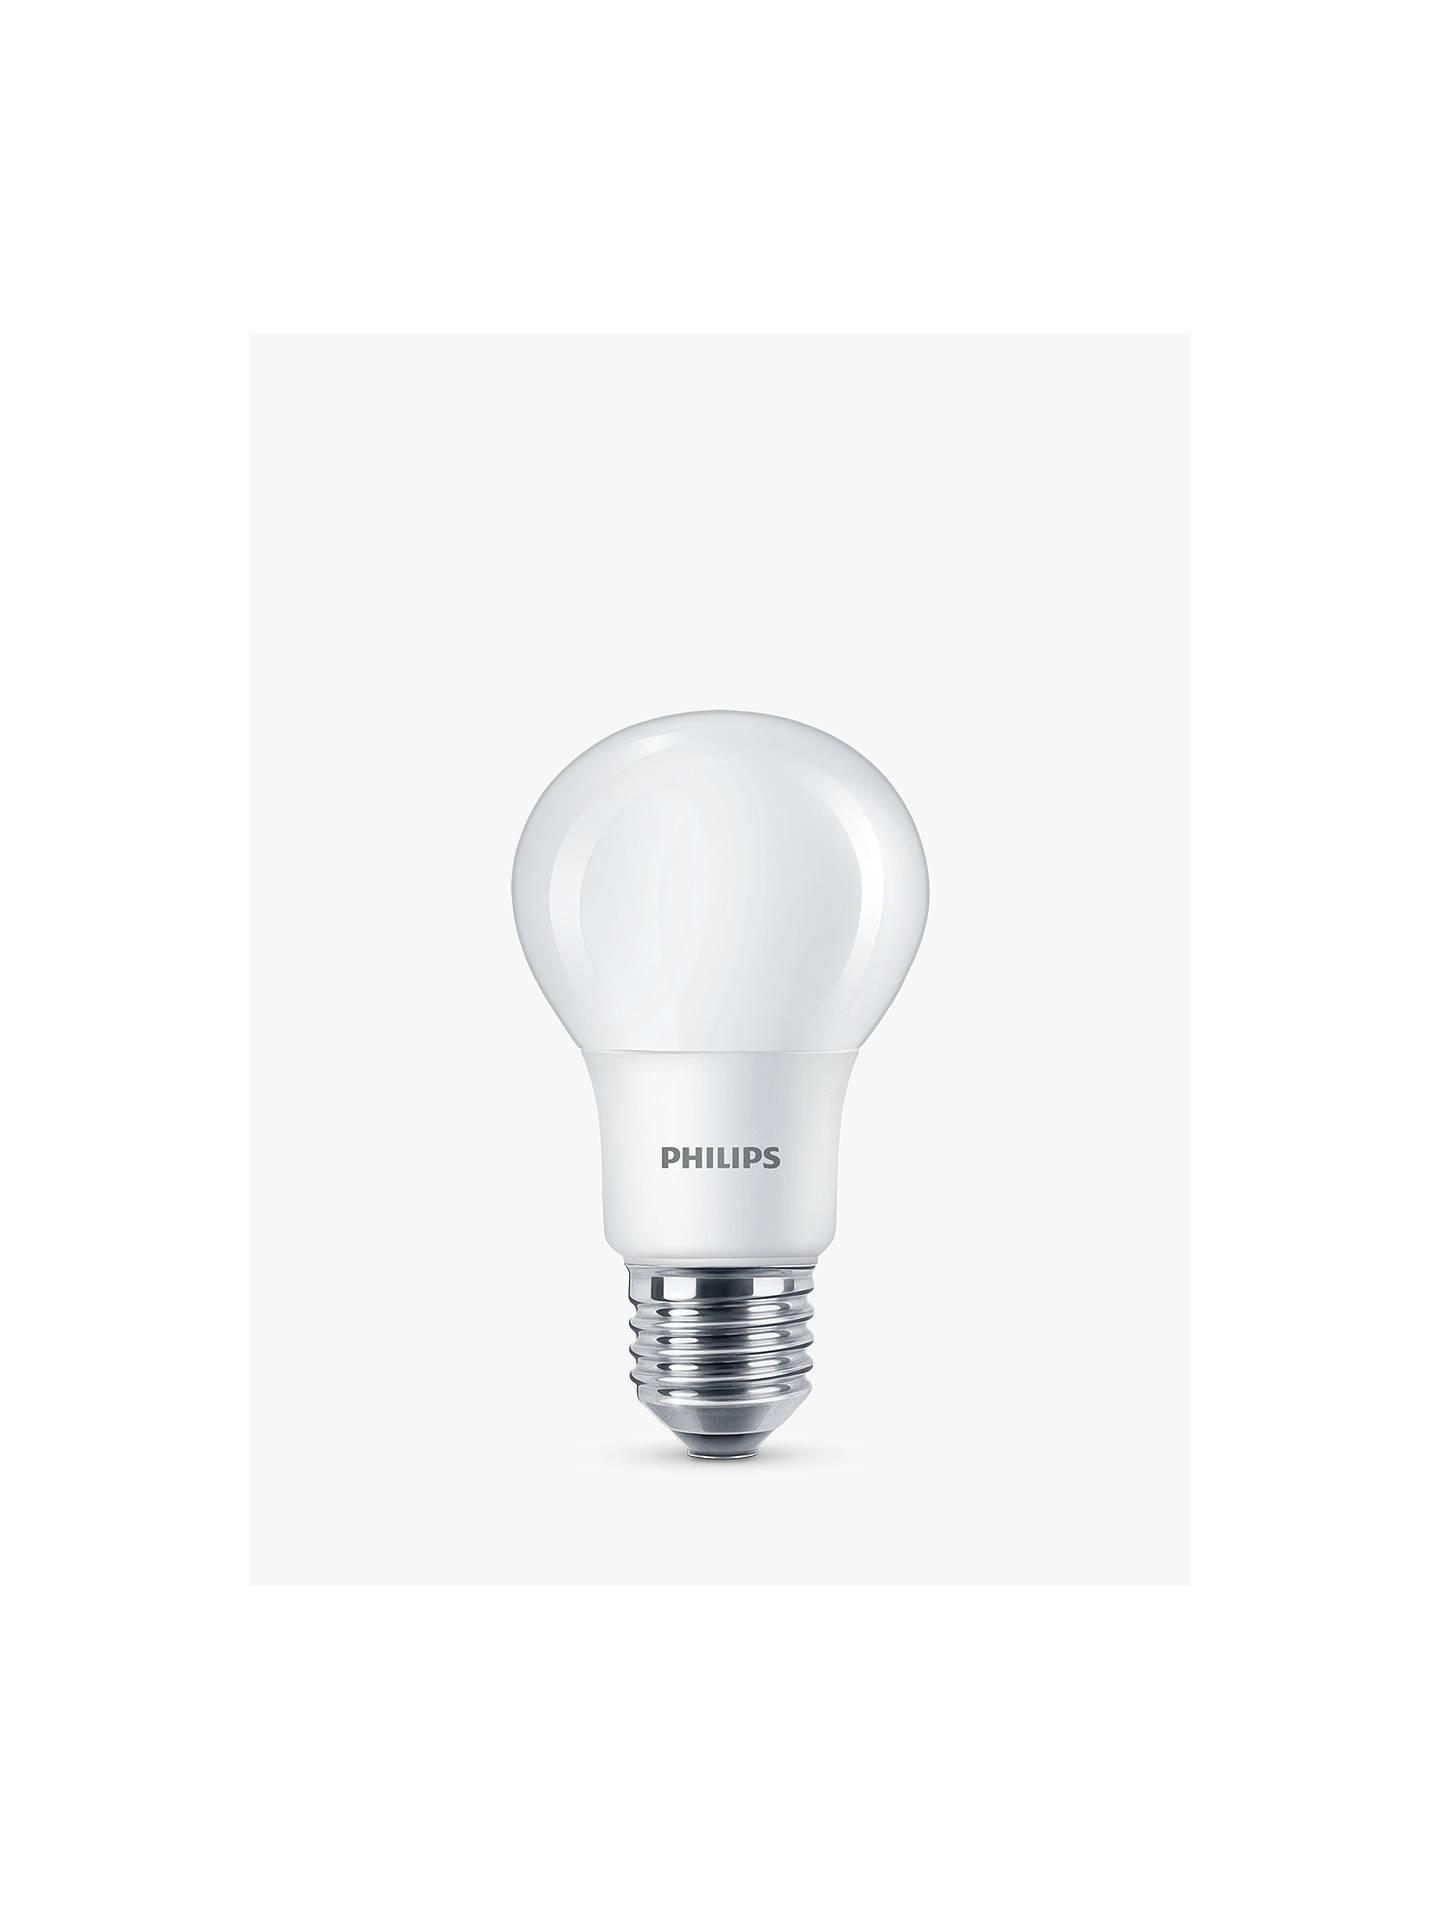 Daylight Led Bulbs: Philips 7.5W ES LED Classic Cool Daylight Light Bulb